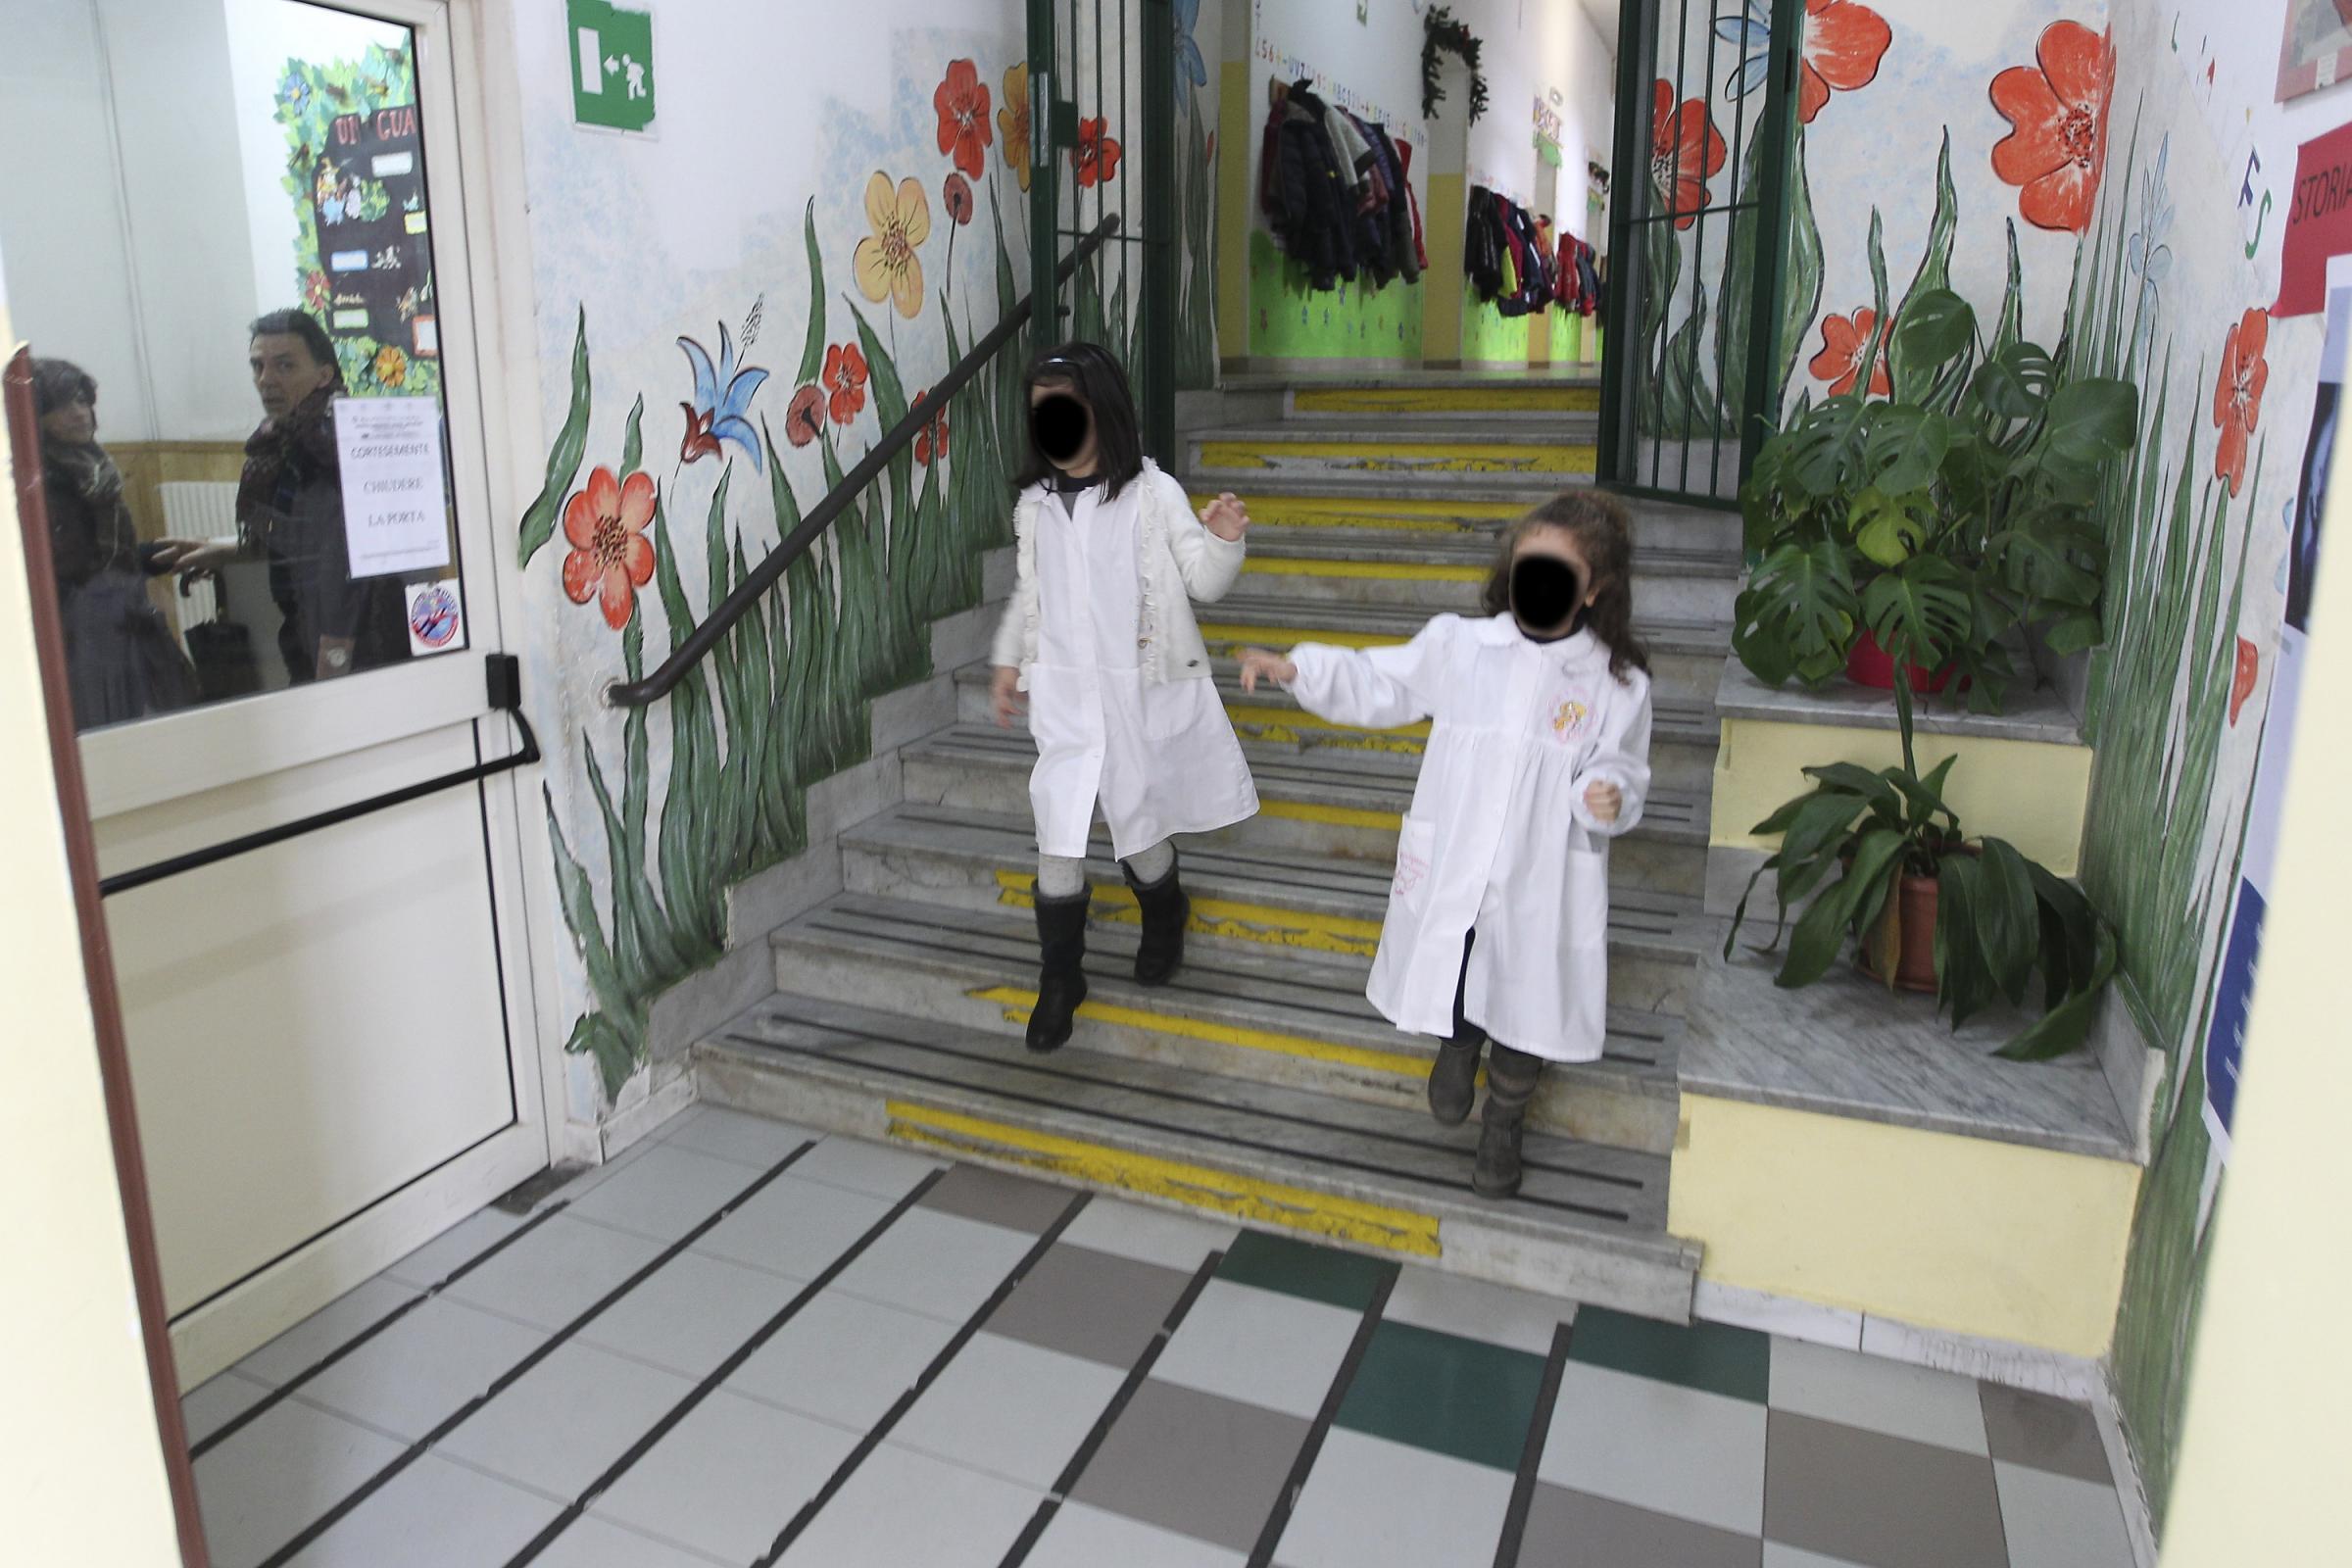 Benevento, sospesa maestra delle elementari: offendeva e picchiava i bambini